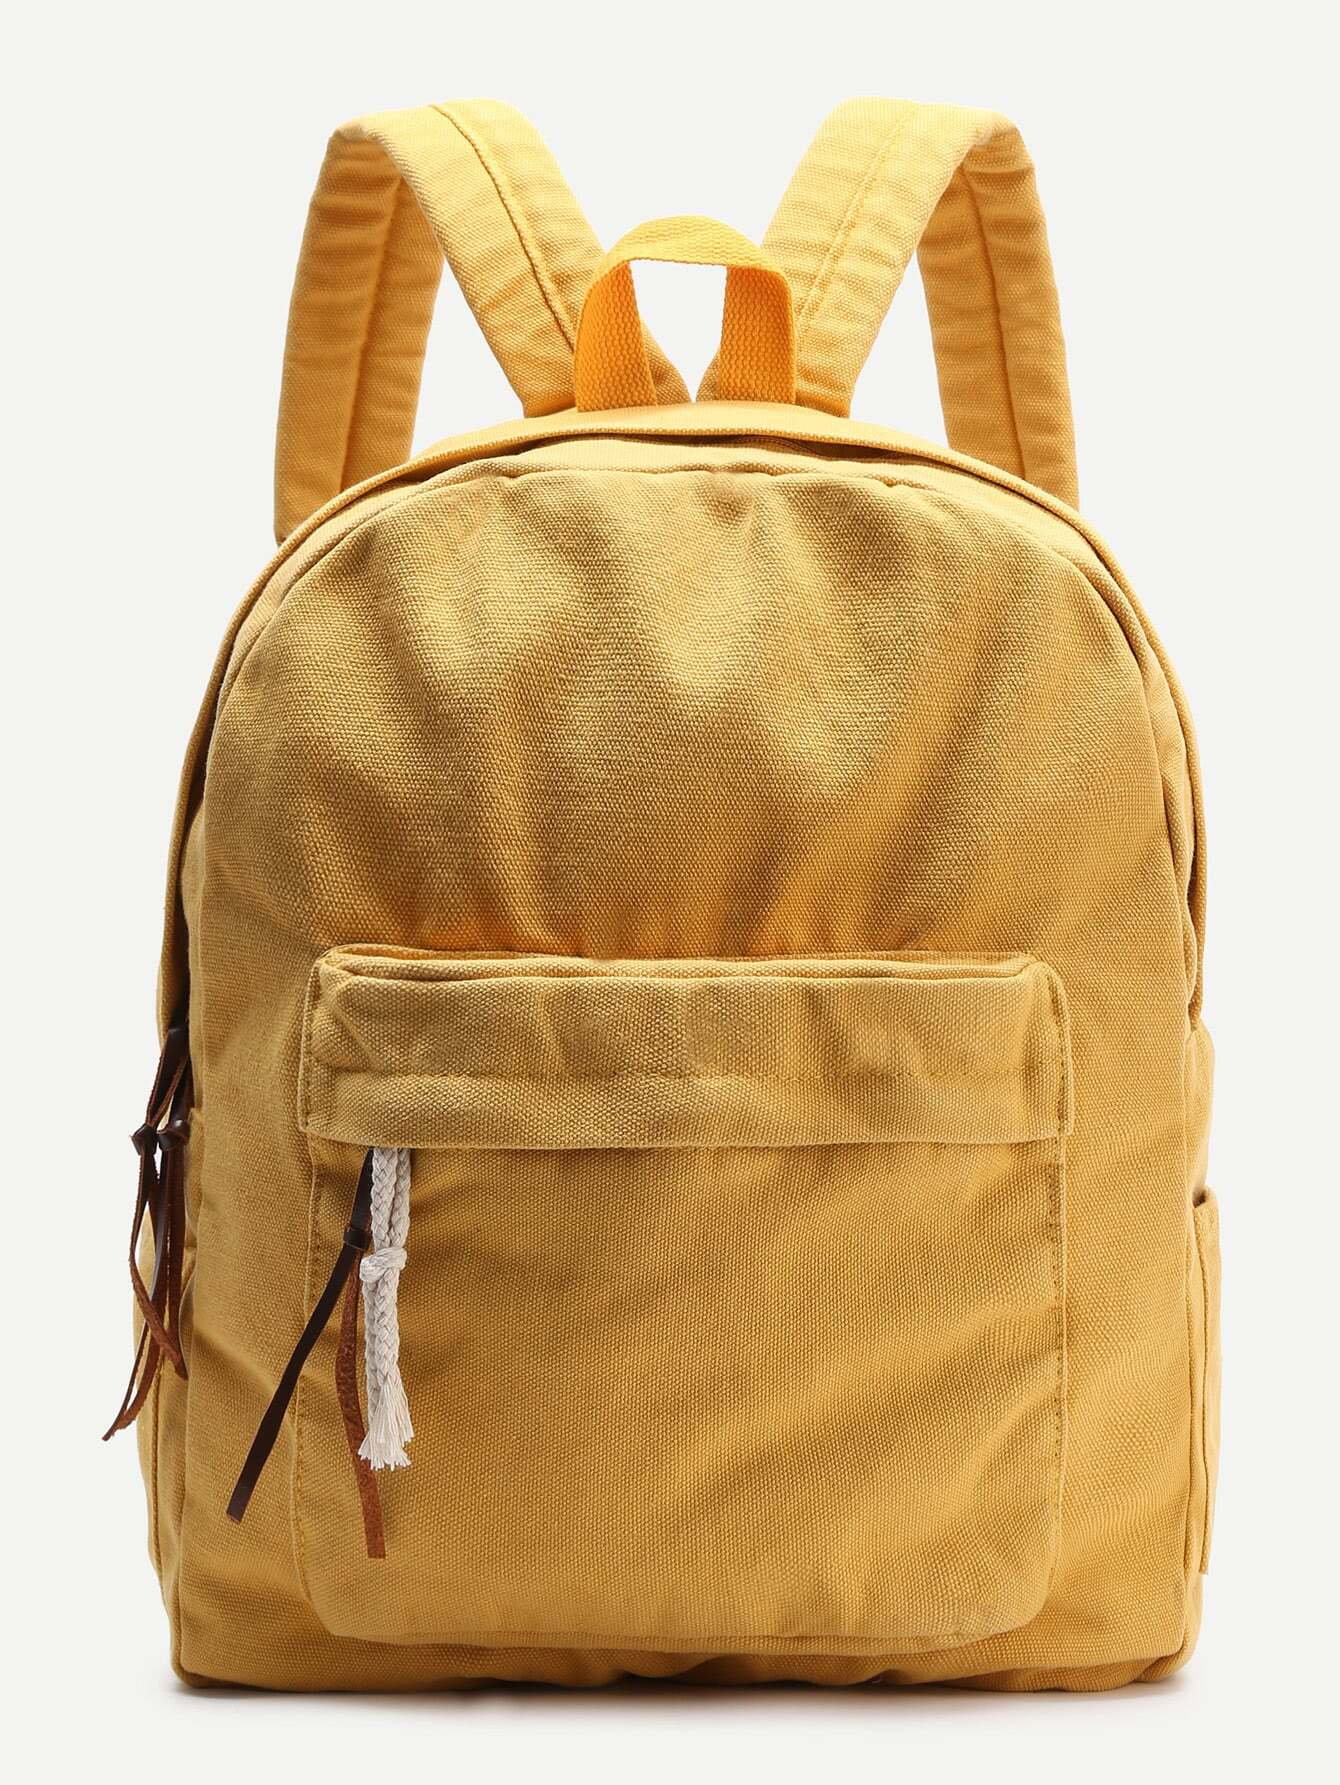 Yellow Zipper Front Canvas BackpackFor Women-romwe